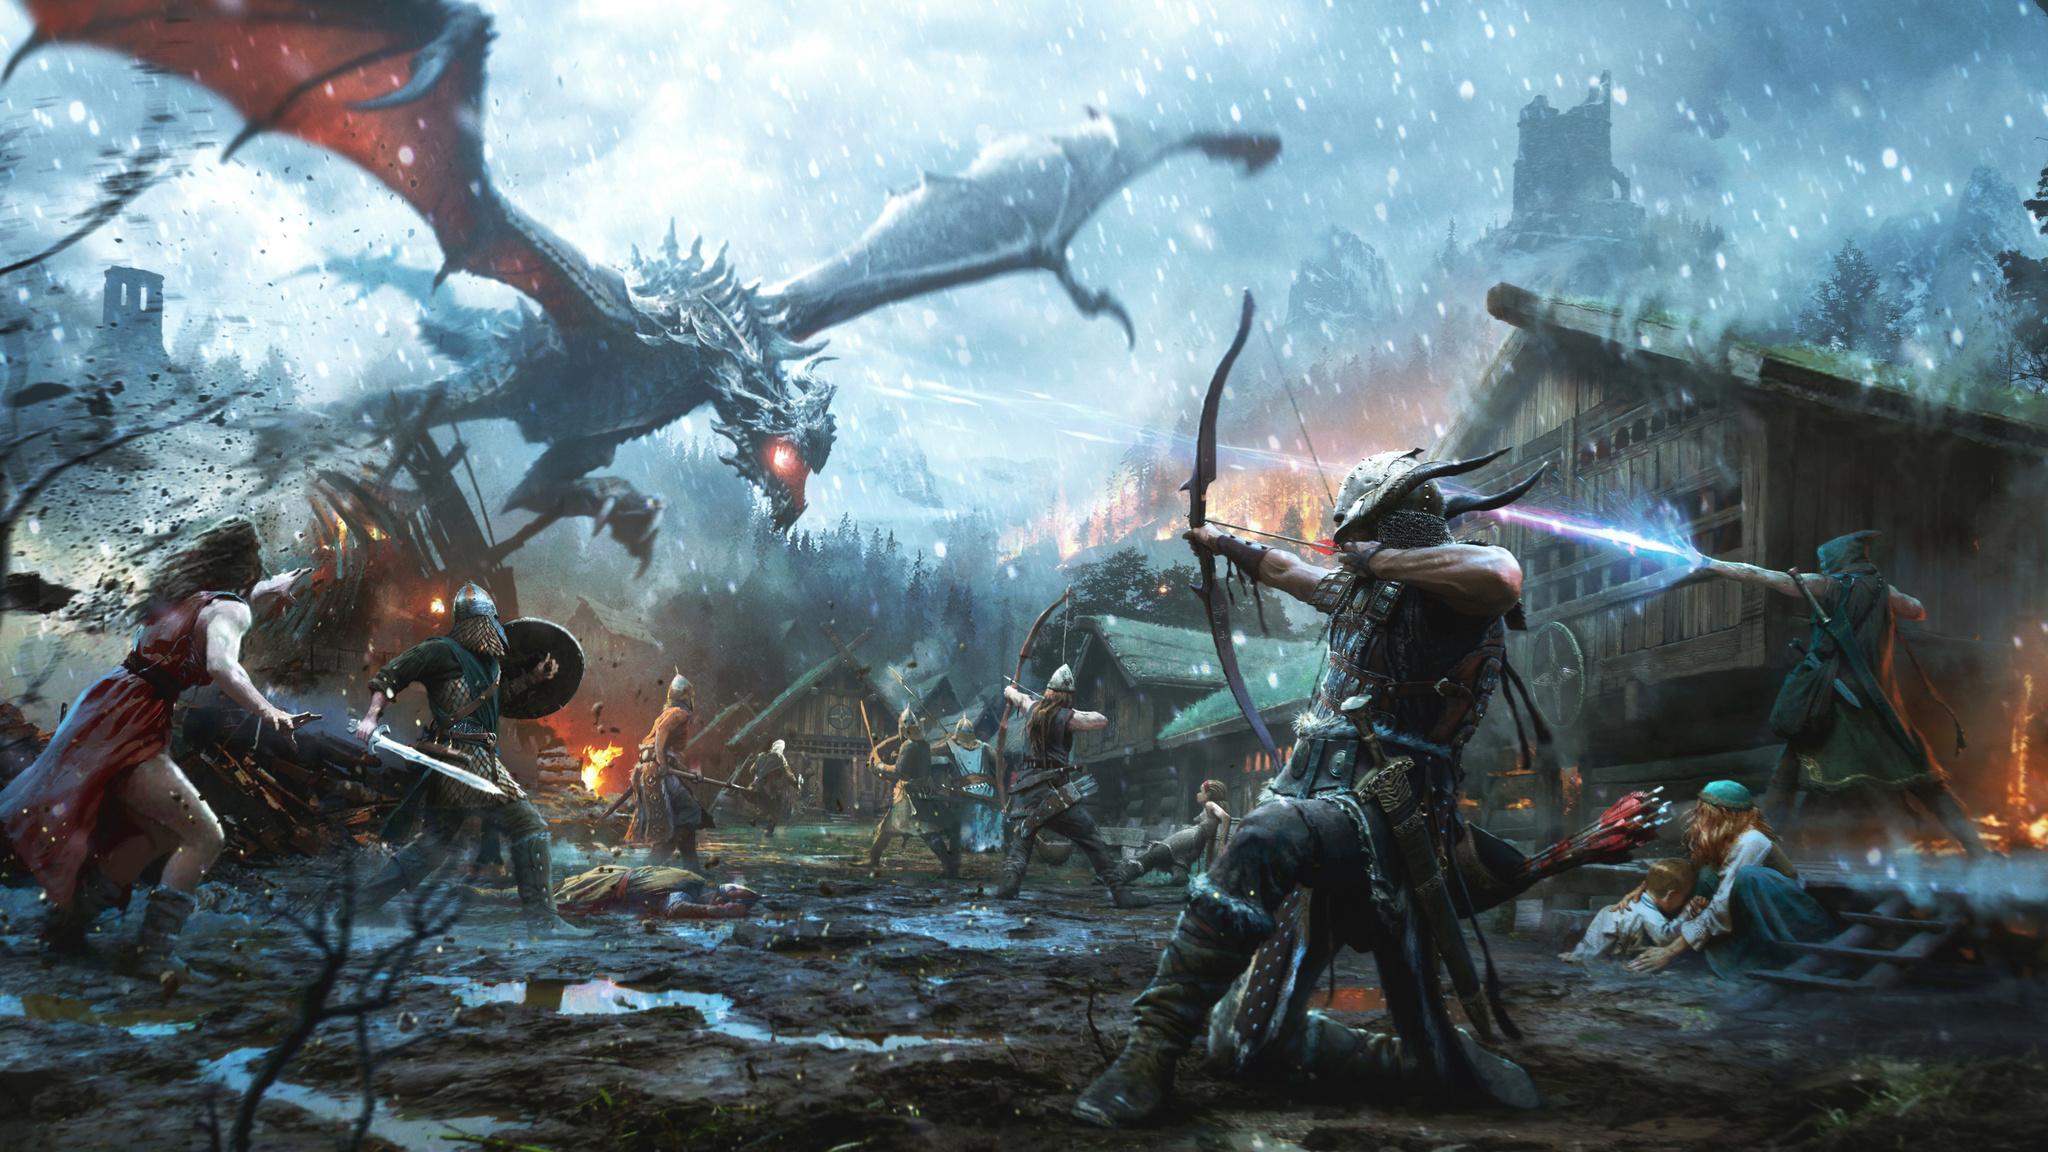 2048x1152 The Elder Scrolls Video Game 4k 2048x1152